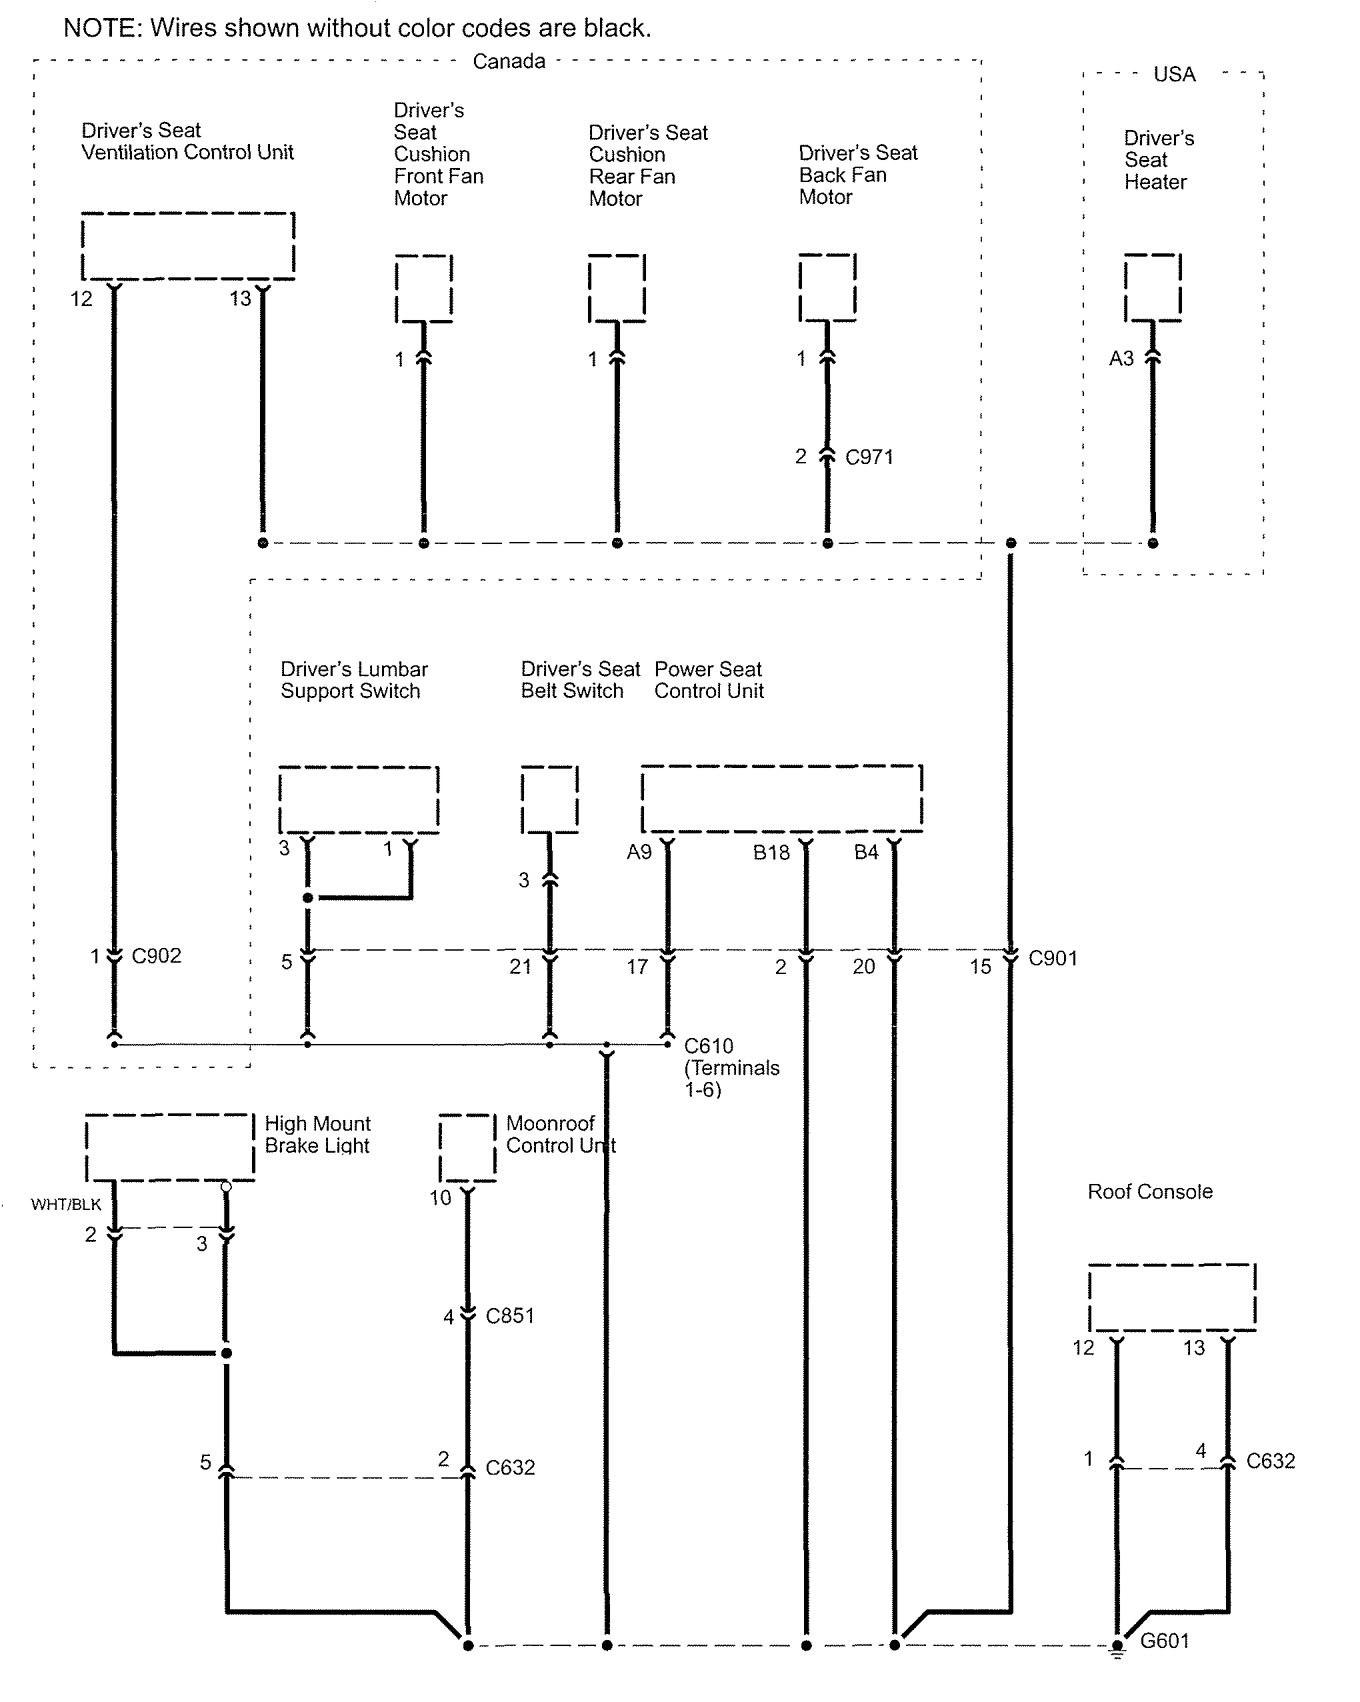 acura rl wiring diagram ground distribution v2 4 2005?resize\=840%2C1051 2005 acura rl wiring diagram 2005 mercury monterey wiring diagram 2006 Acura RL Interior at gsmportal.co